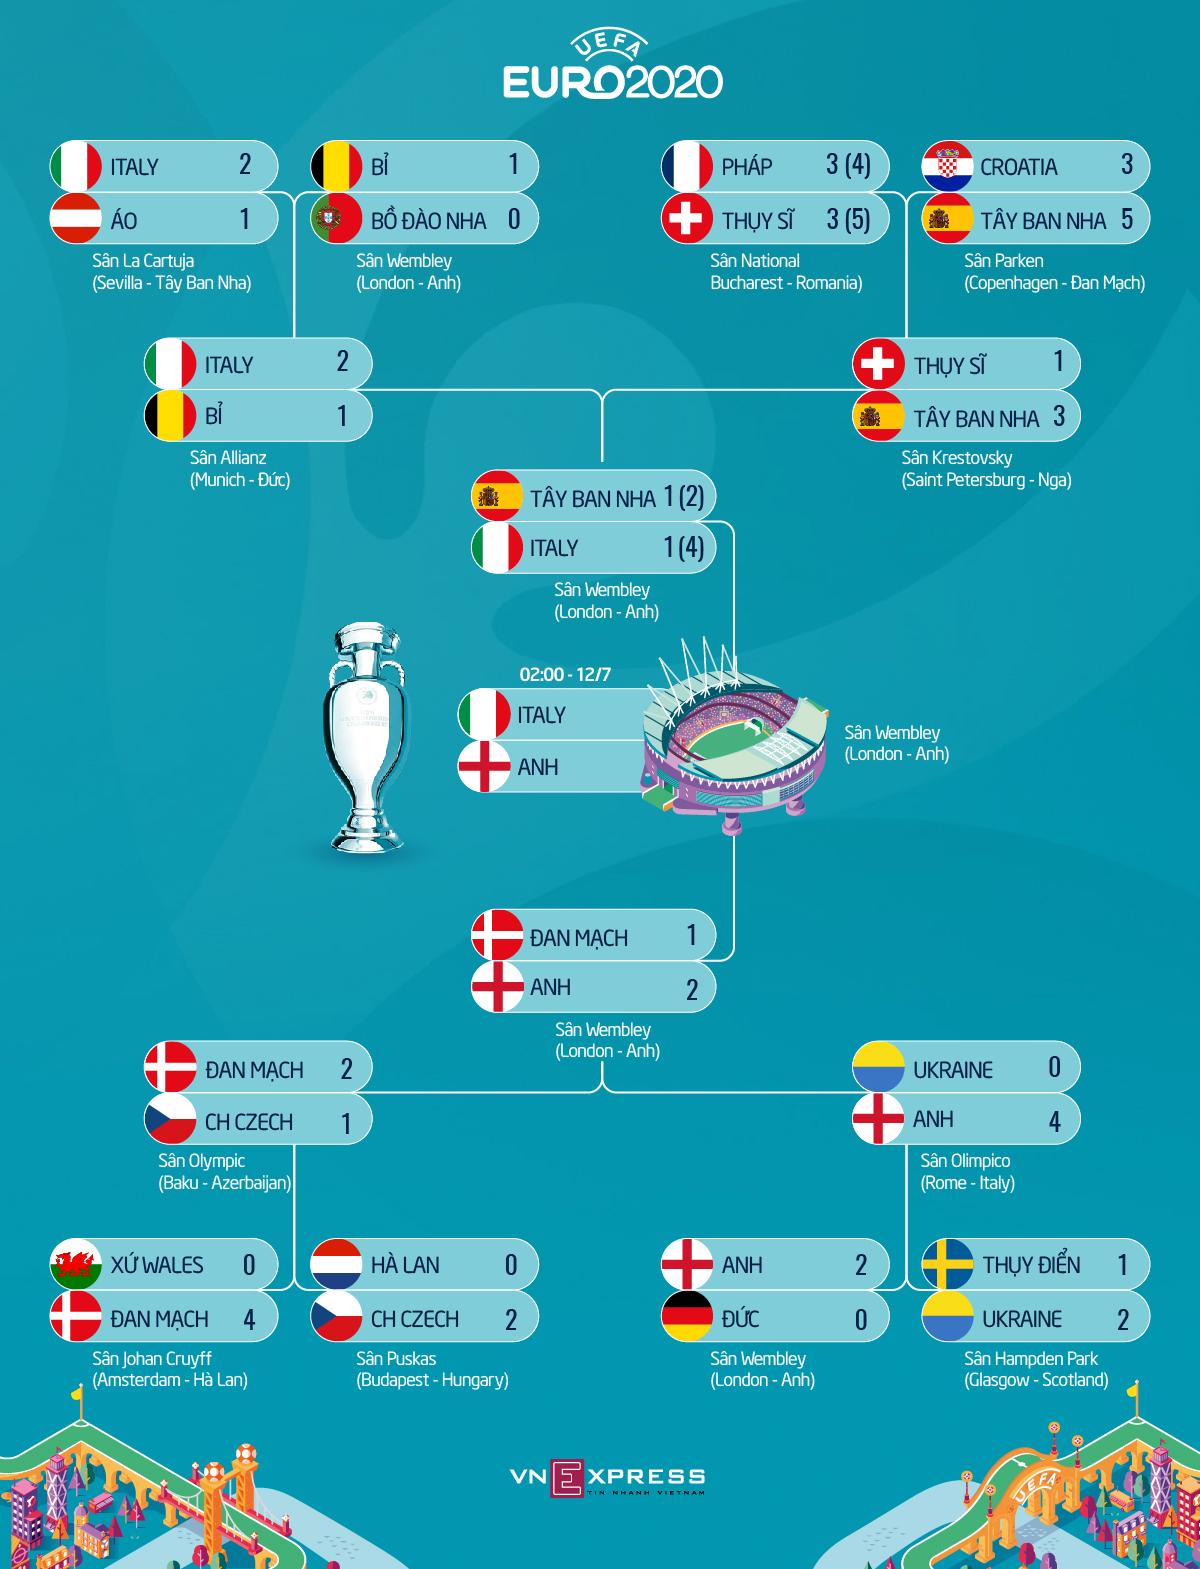 Carragher: Final Euro ditentukan oleh 11jt - 1